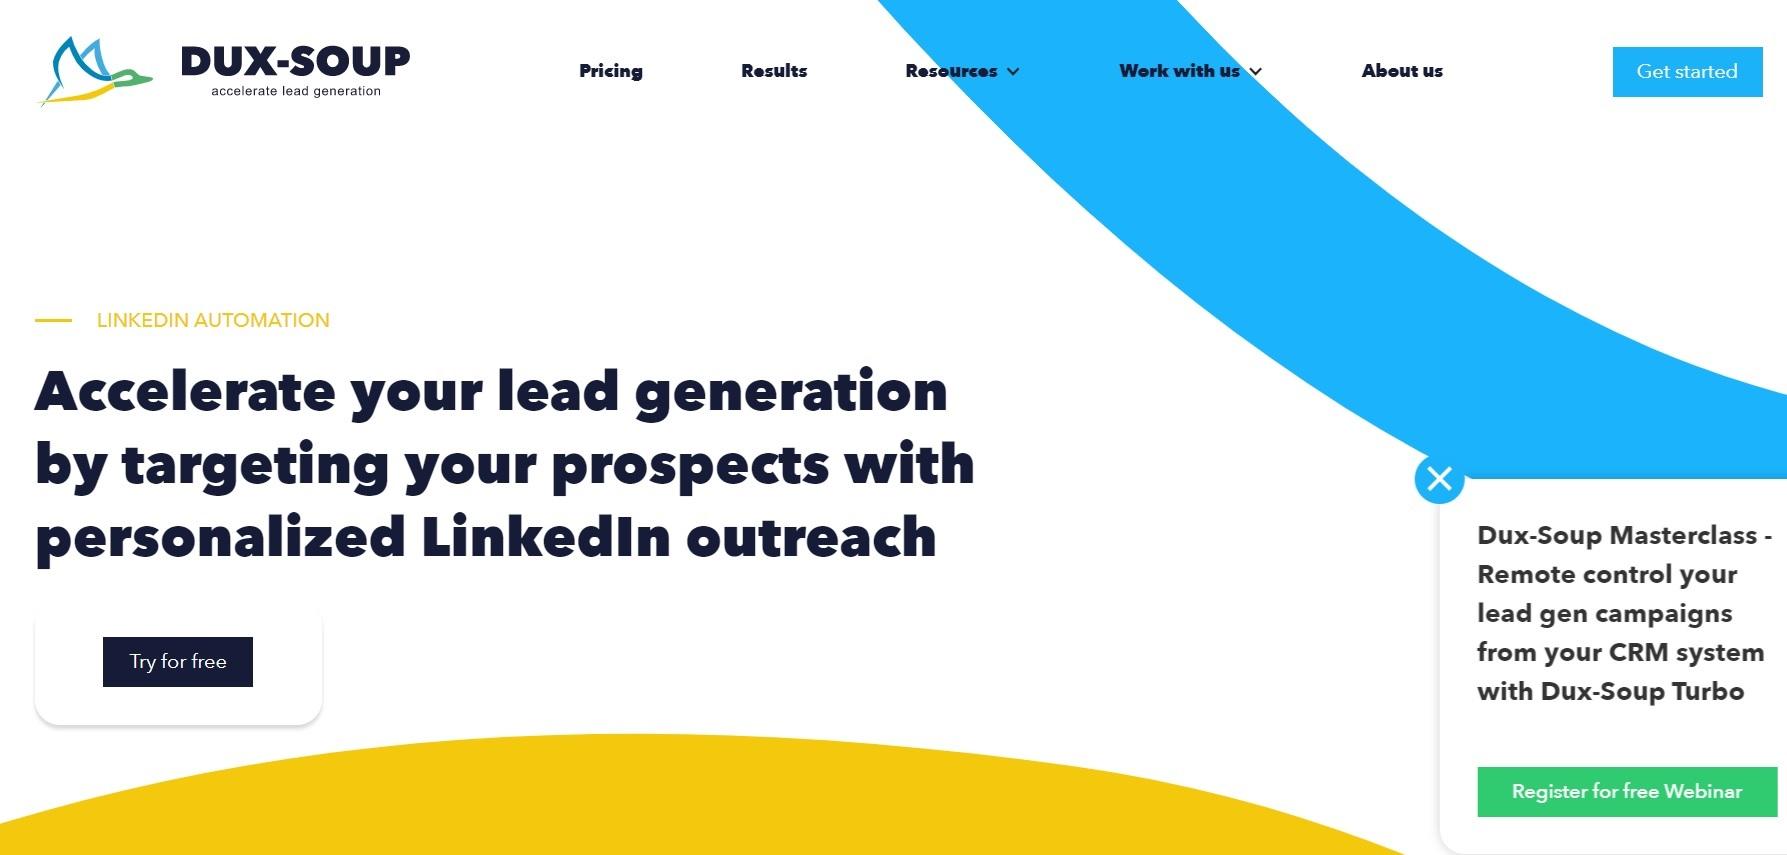 A screenshot of LinkedIn automation tool, Duxsoup.